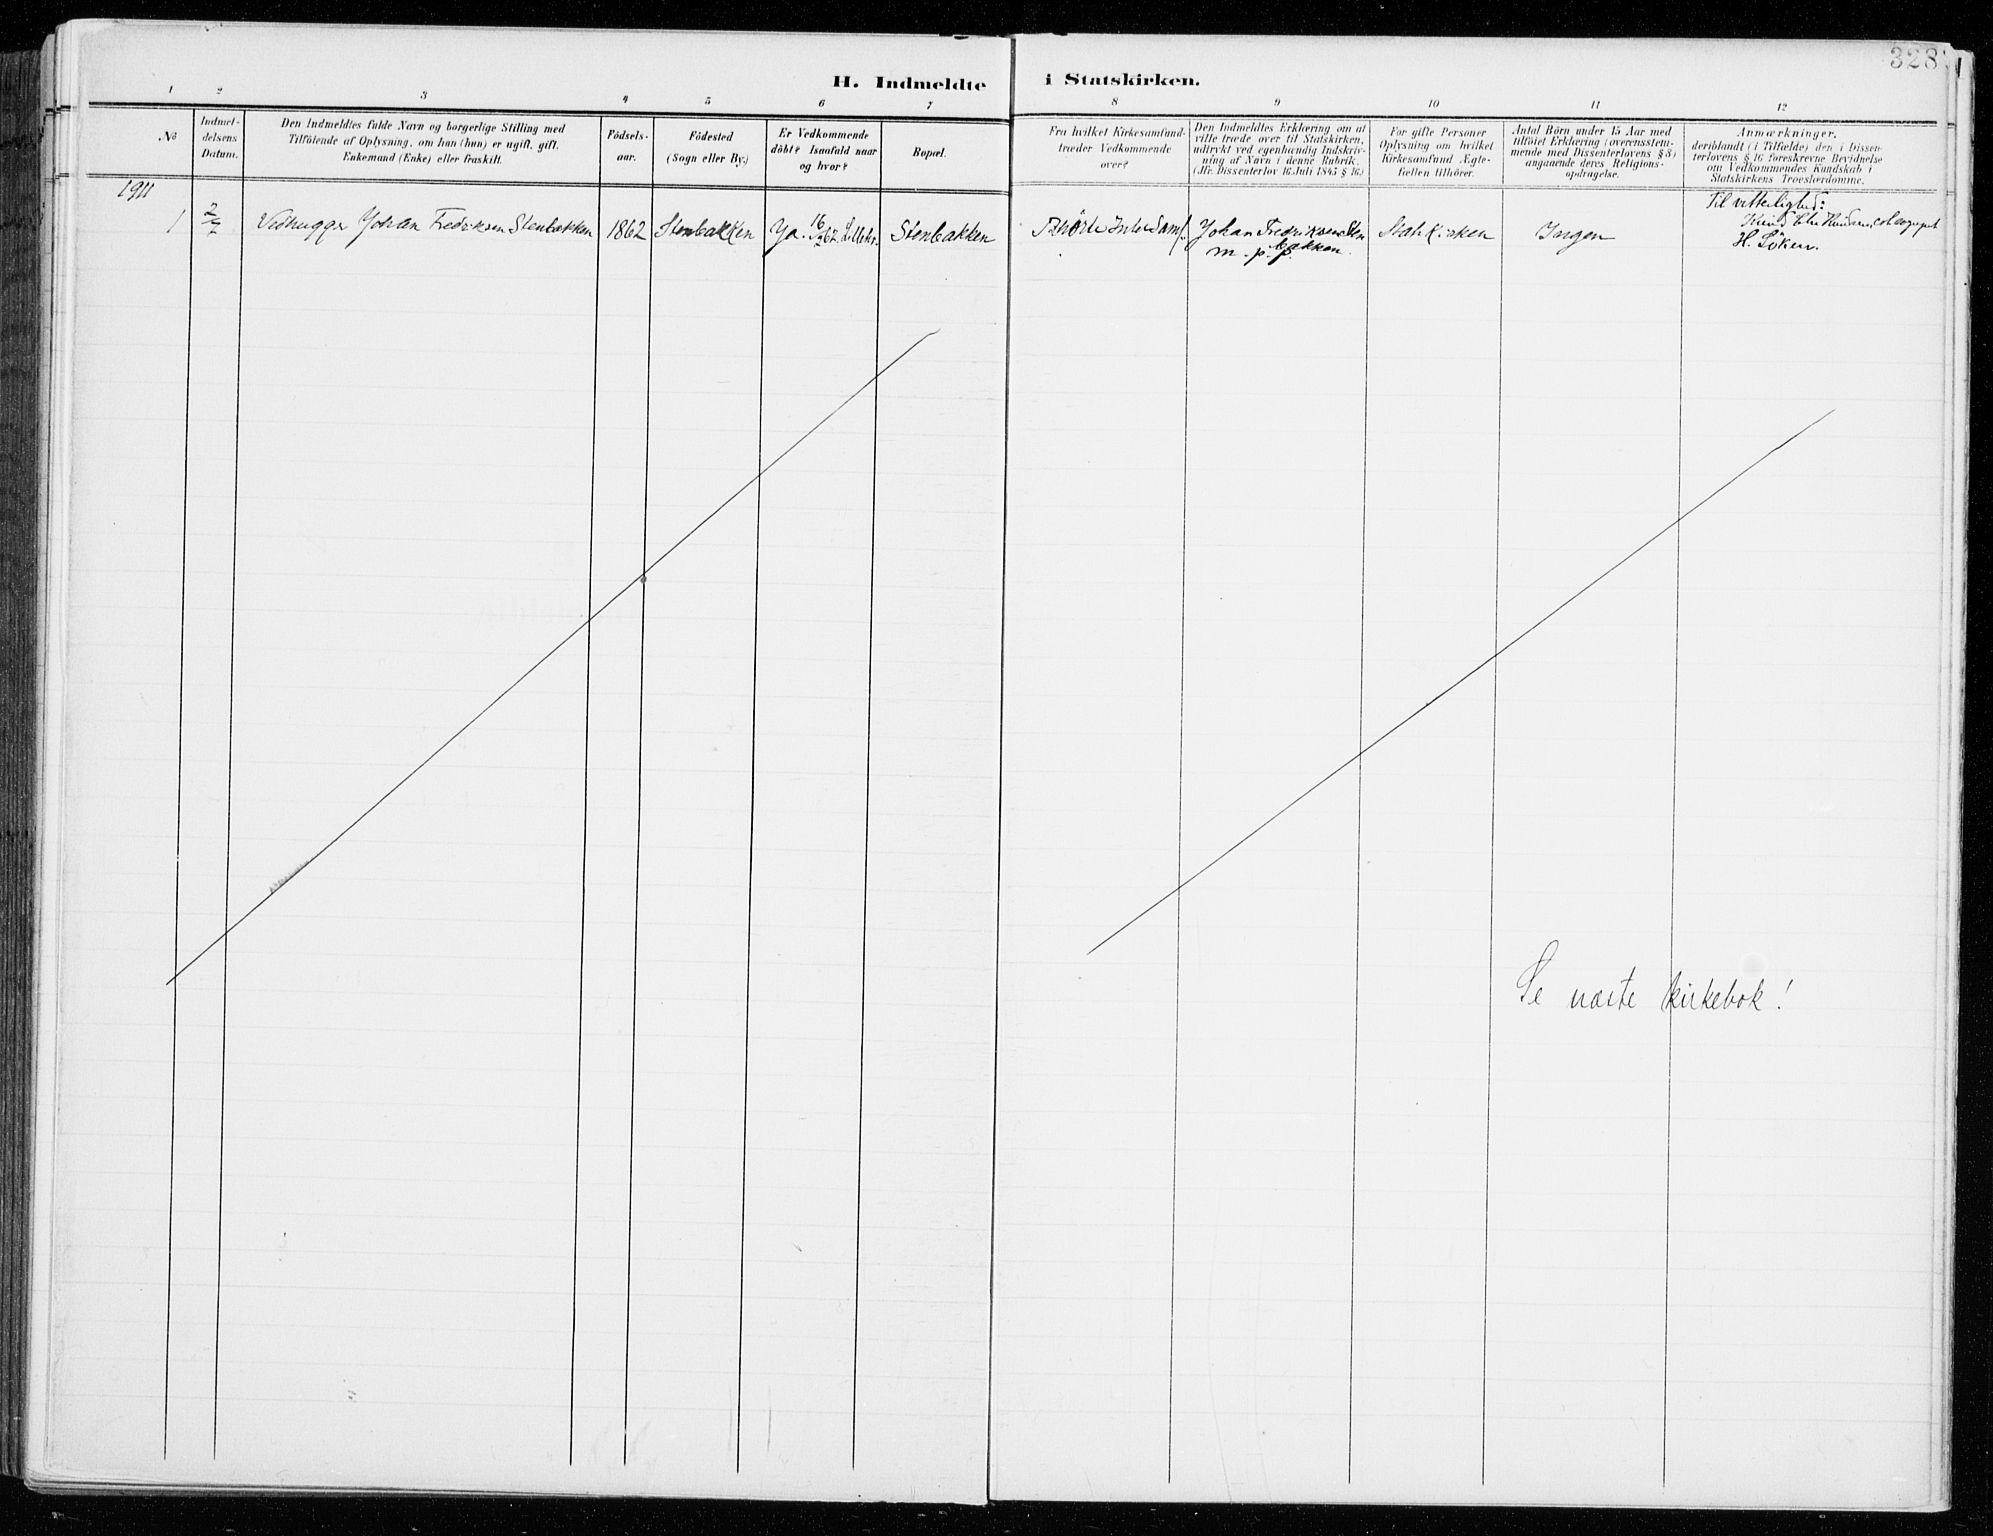 SAH, Fåberg prestekontor, H/Ha/Haa/L0011: Parish register (official) no. 11, 1899-1913, p. 328